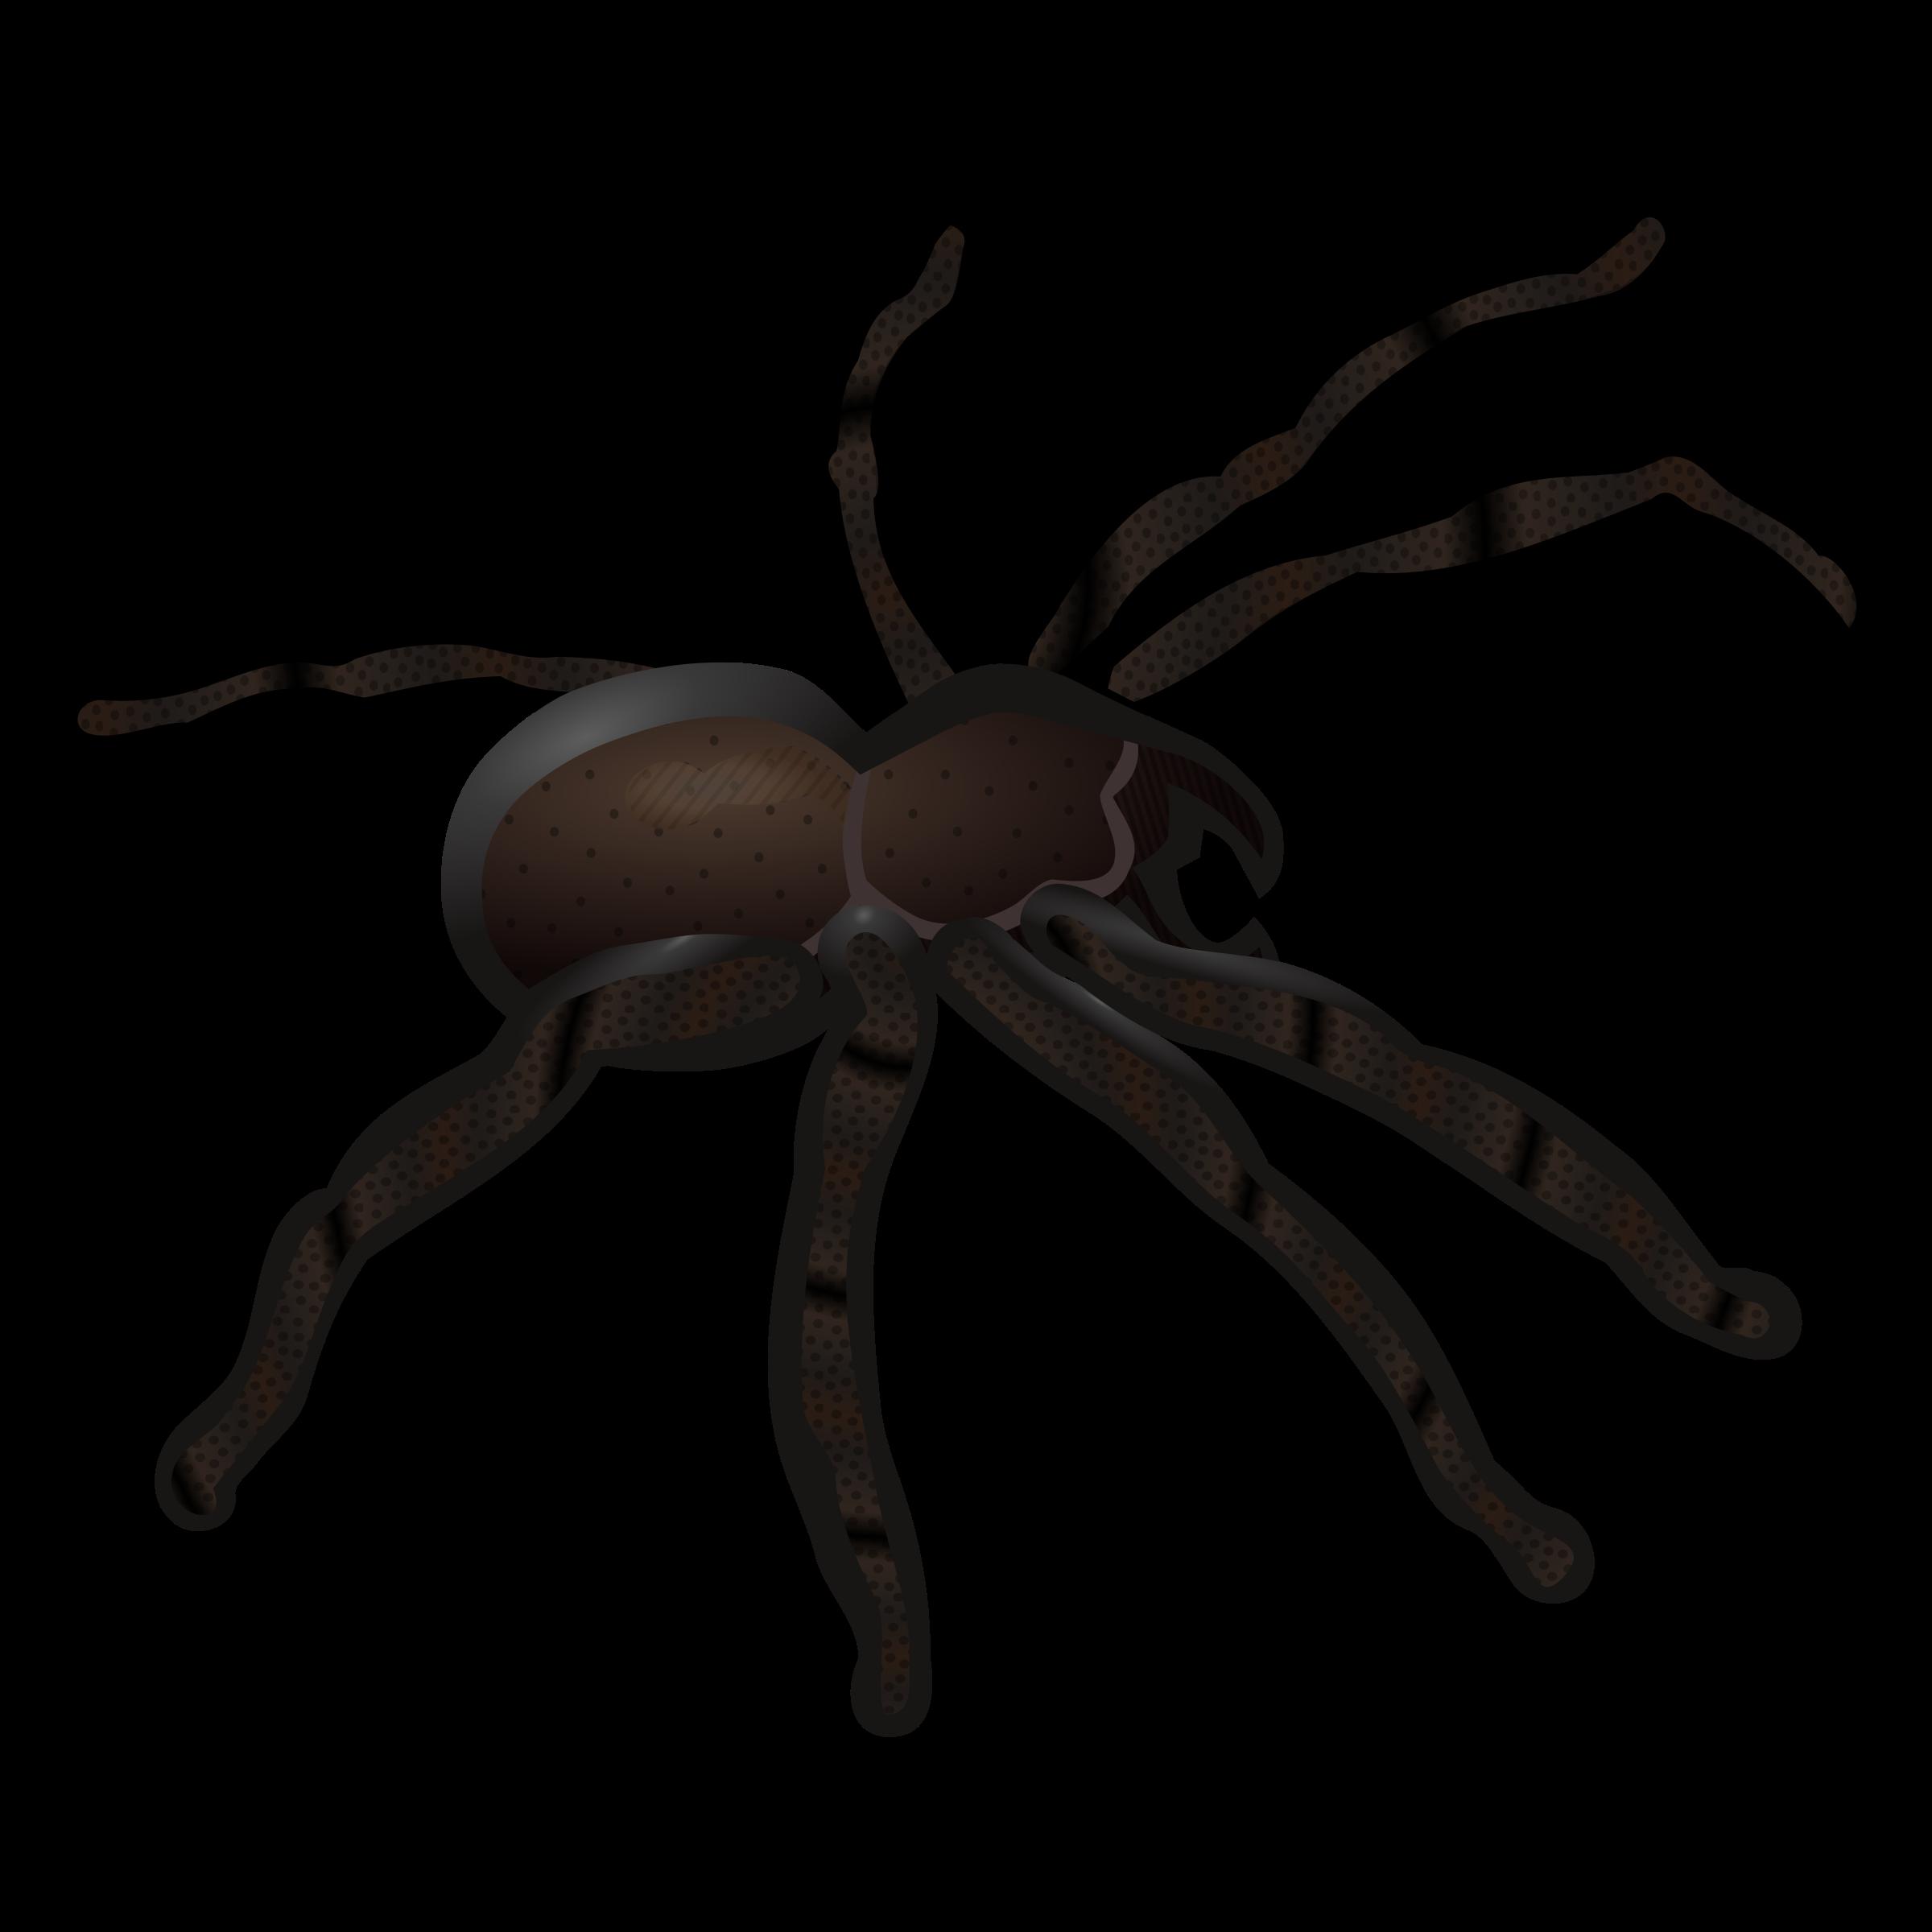 2400x2400 Clip Art Clip Art Spider